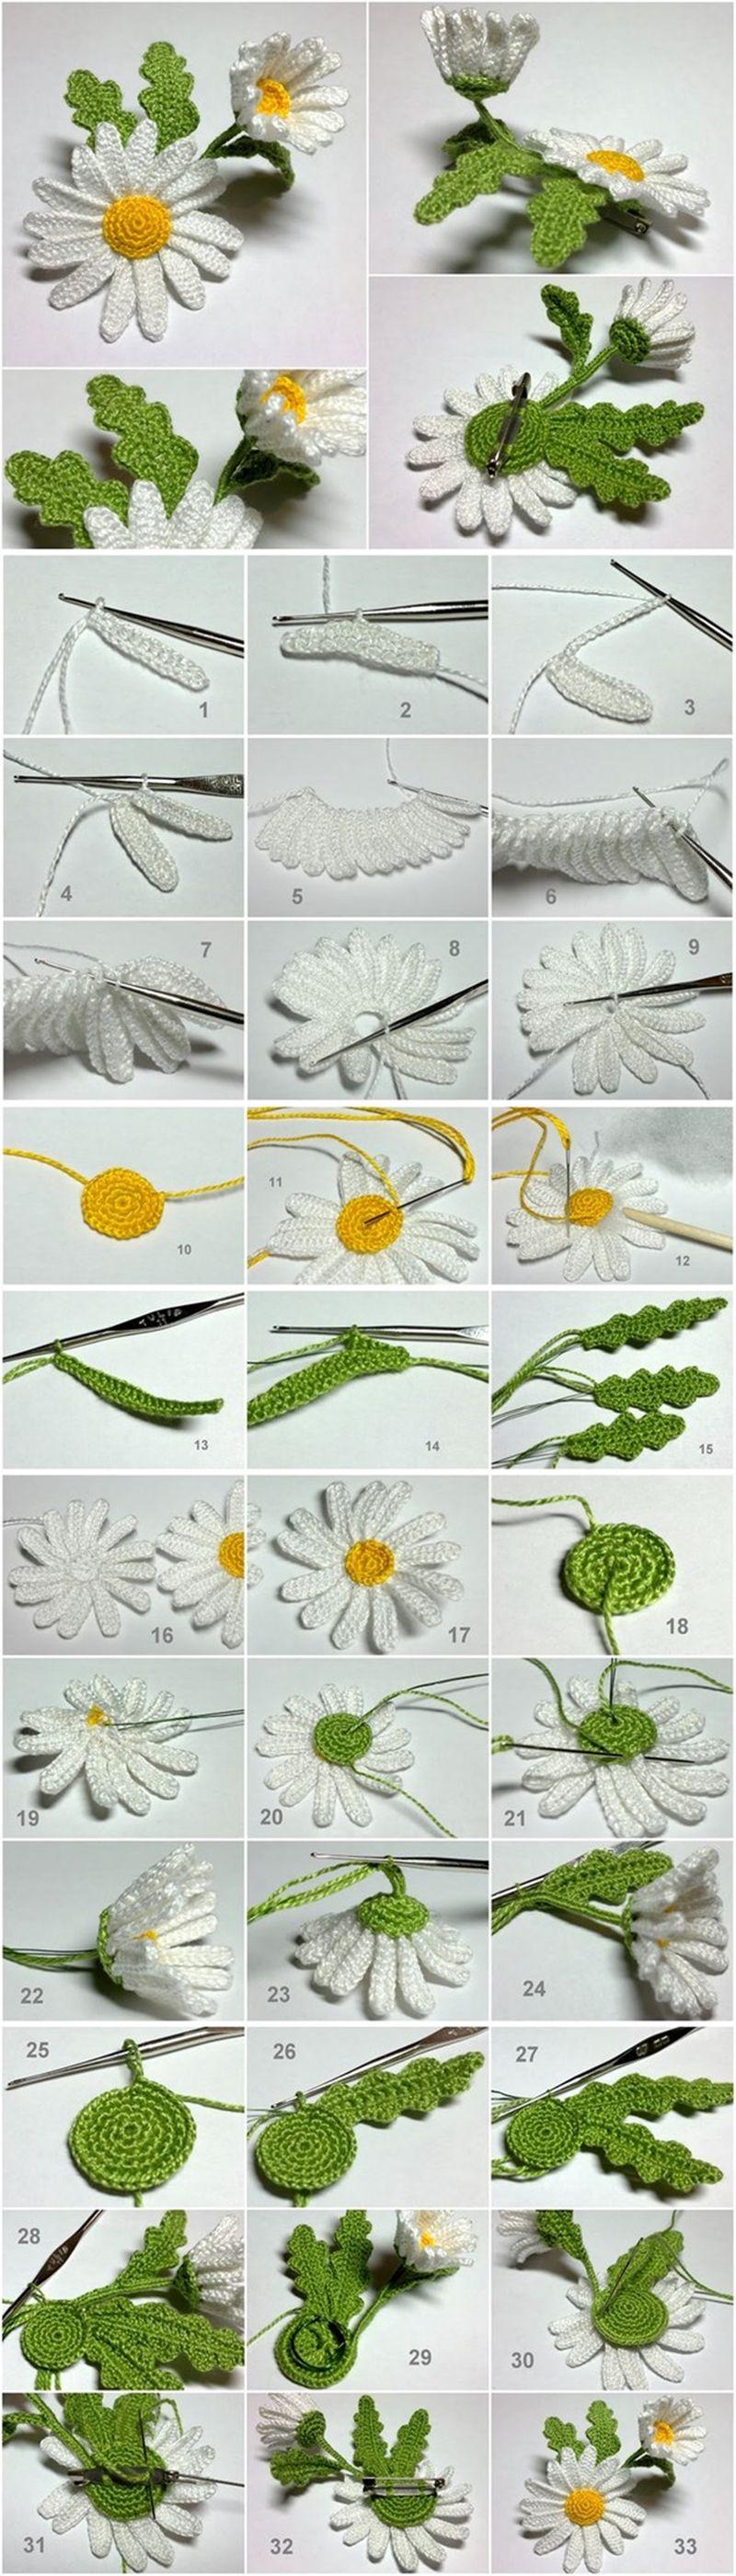 margarita tutorial ganchillo 3D | Patrones De Ganchillo | Pinterest ...